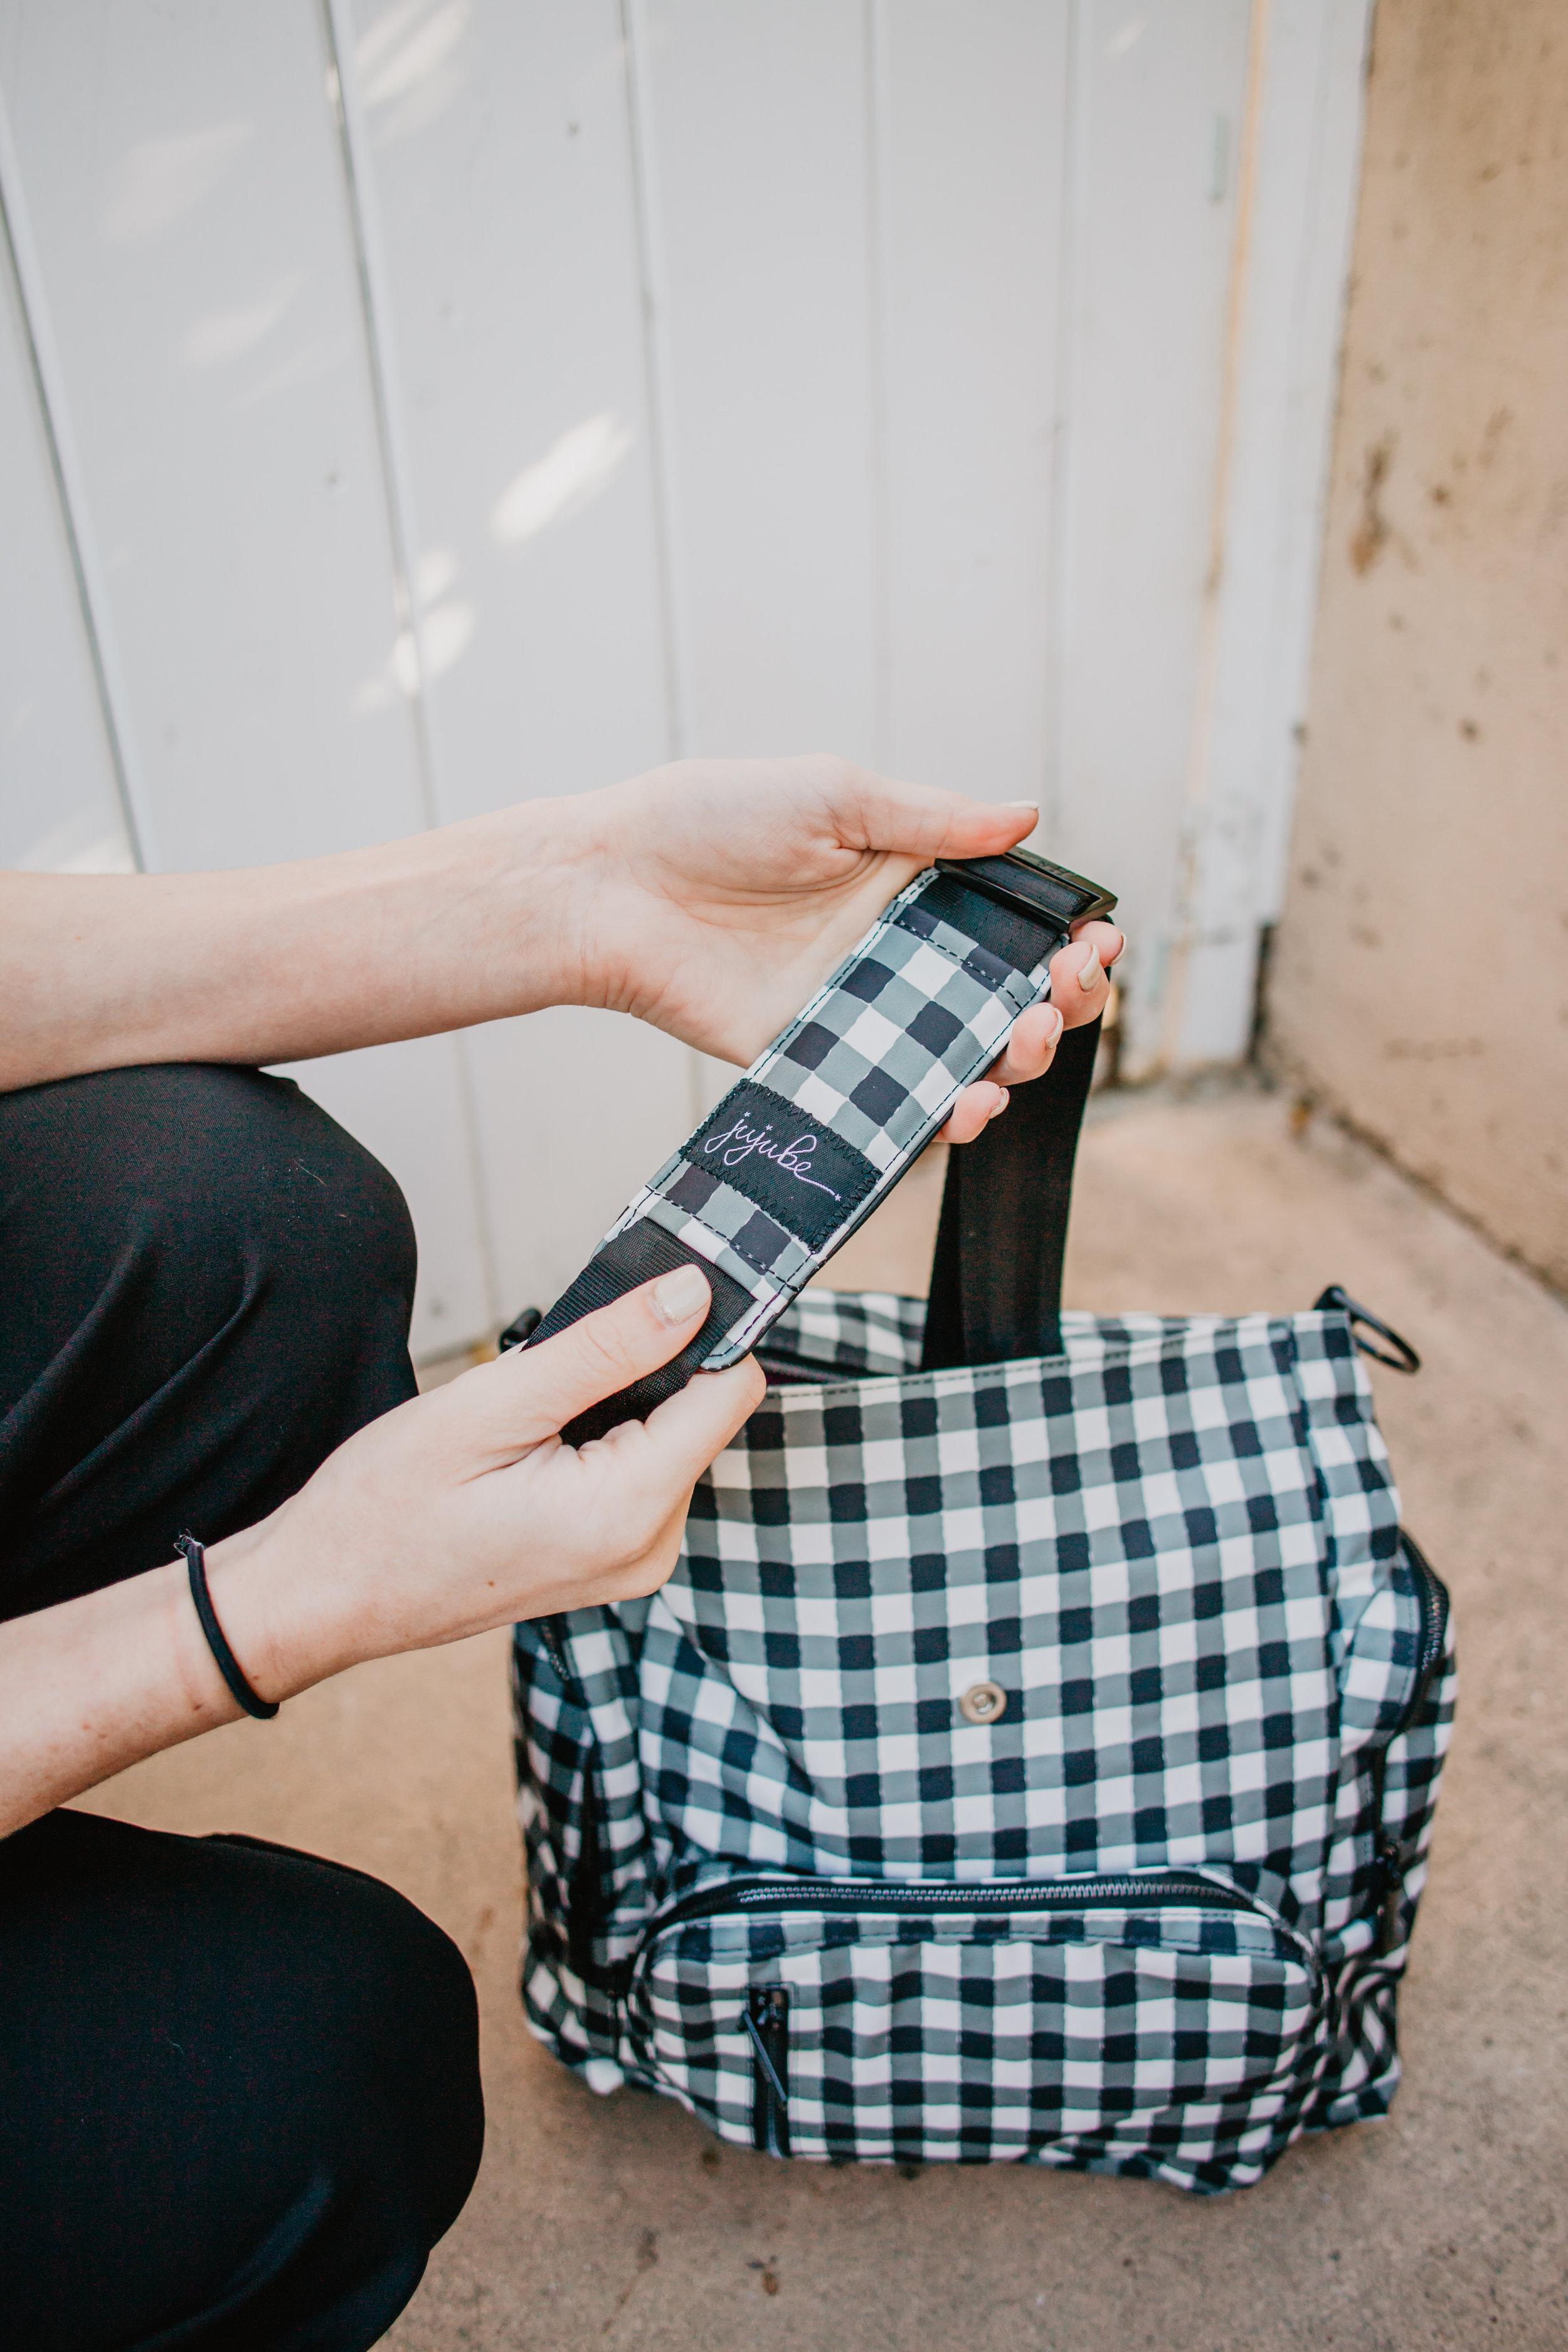 Trendy Diaper Bag Backpacks - Ju-Ju-Be Gingham Style Be Sporty -- Mommy Blog - The Overwhelmed Mommy